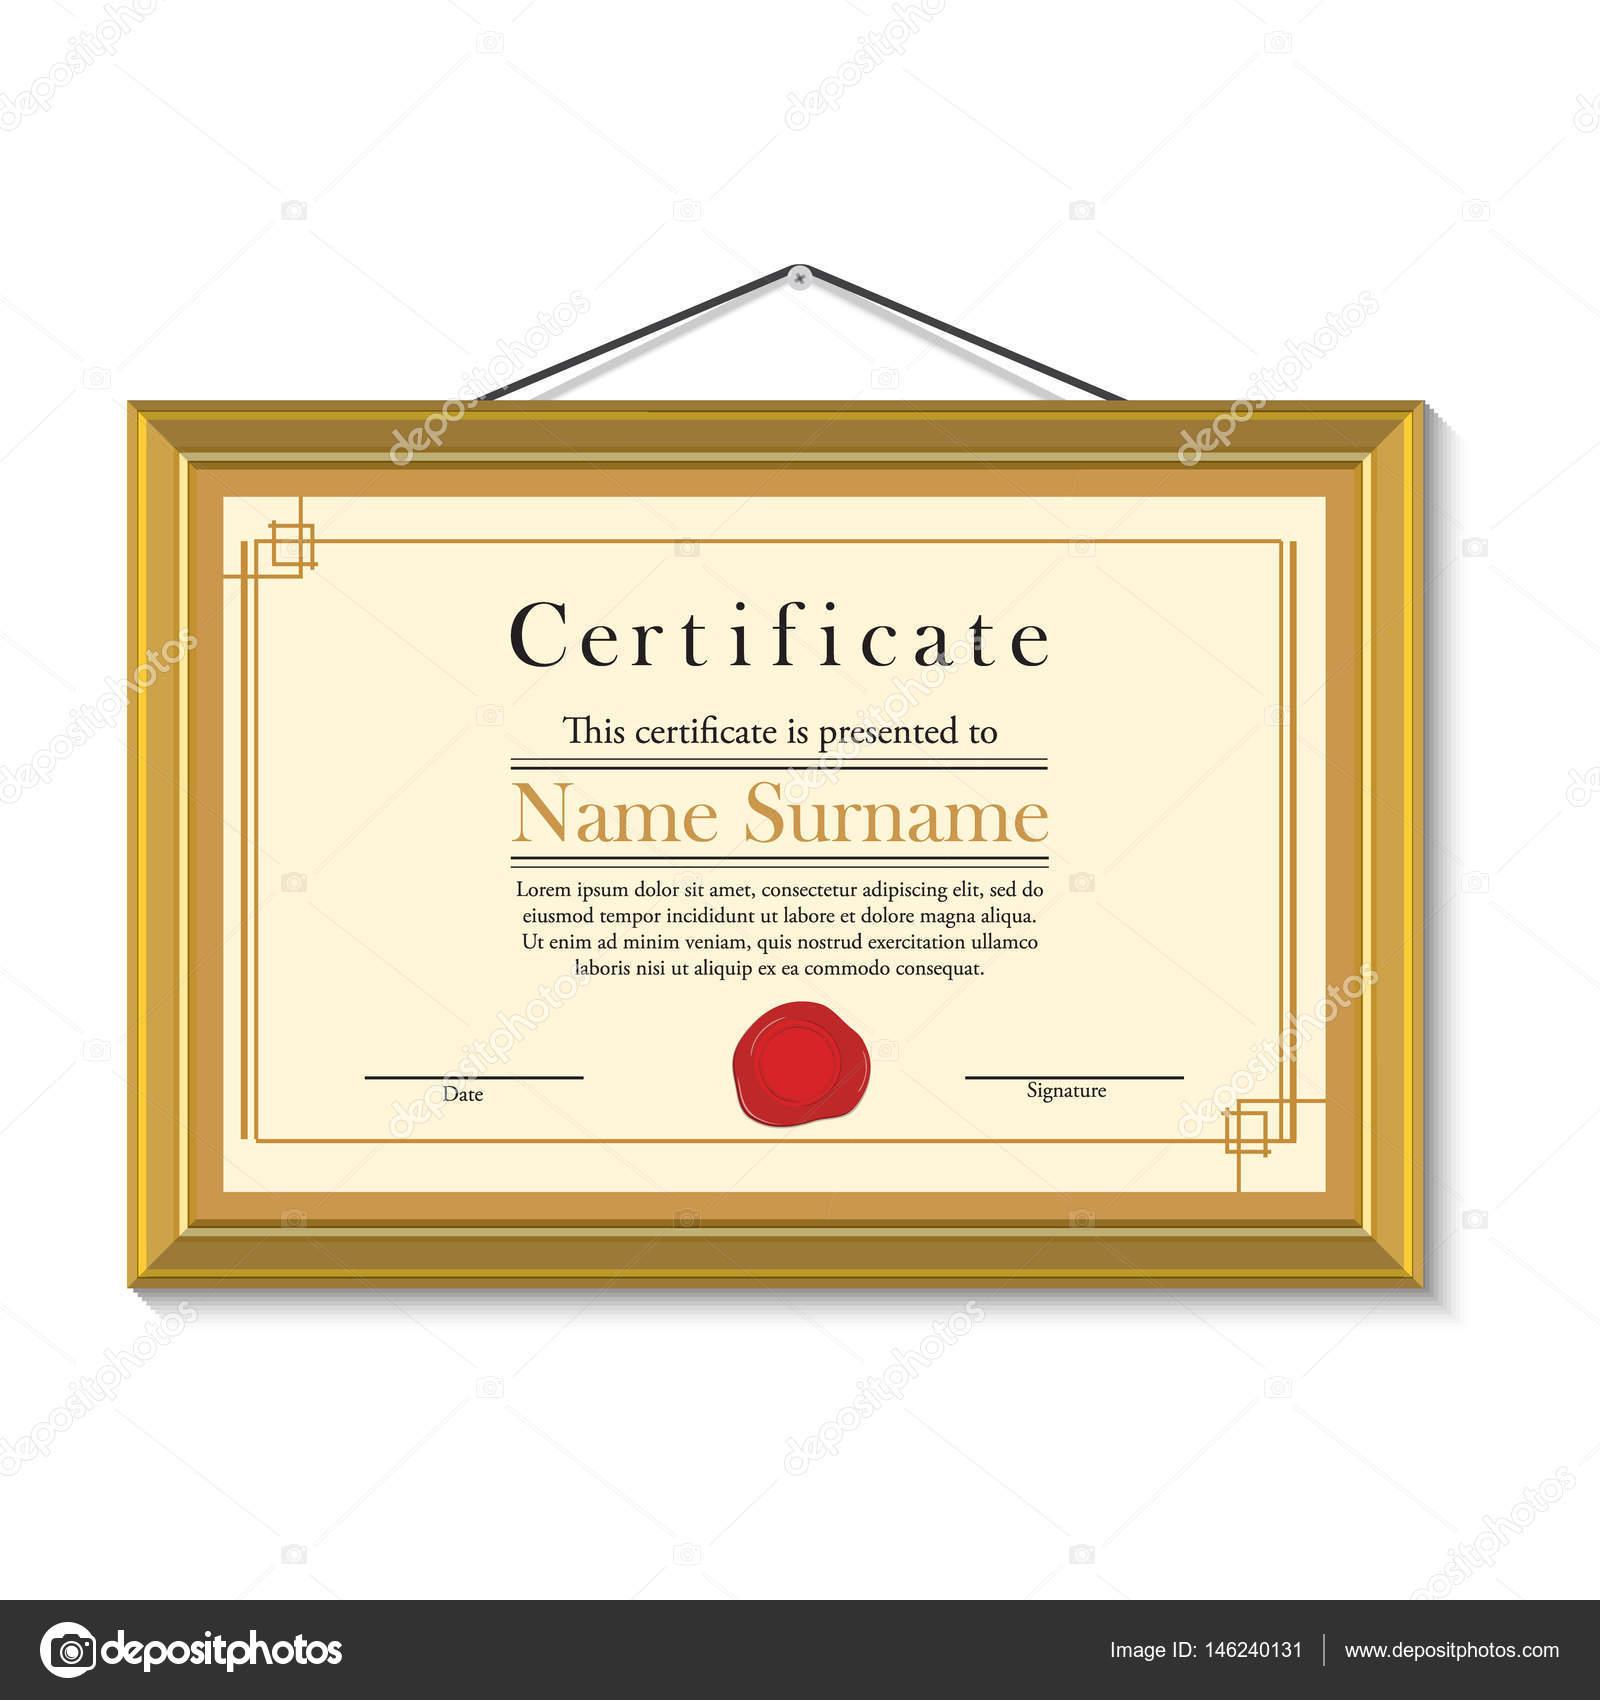 Zertifikat im goldenen Rahmen — Stockfoto © viktorijareut #146240131